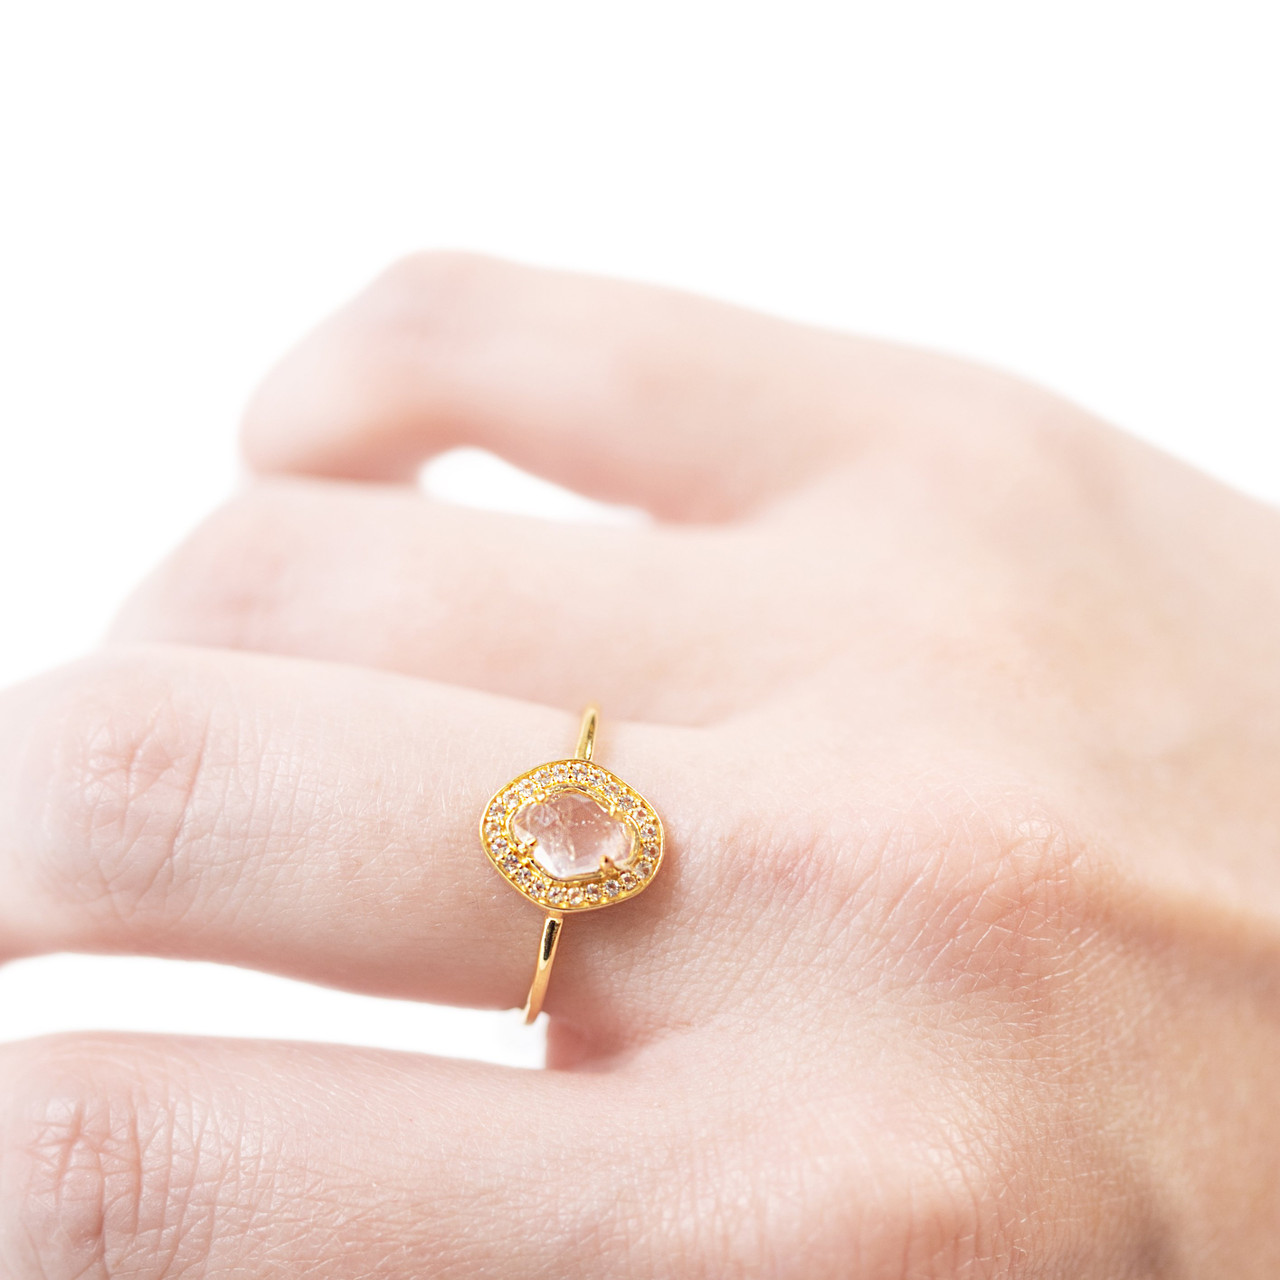 gold ring with rose quartz center stone